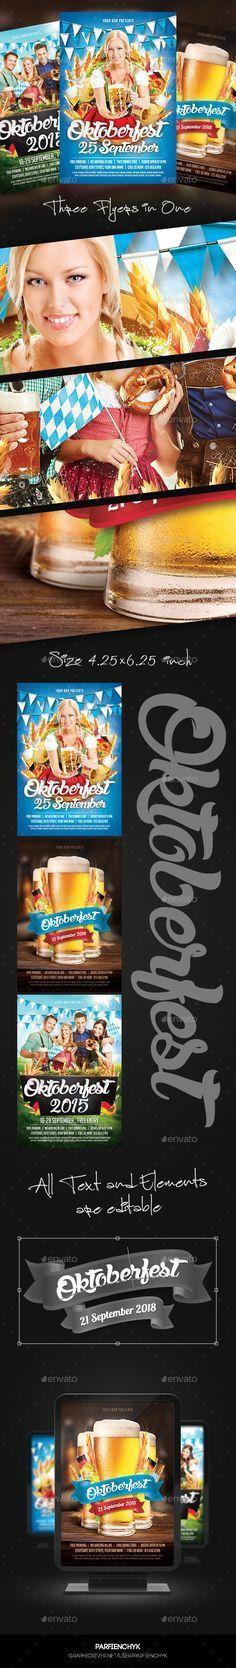 Oktoberfest Party Flyer Template PSD - Holidays Events | My Flyer ...